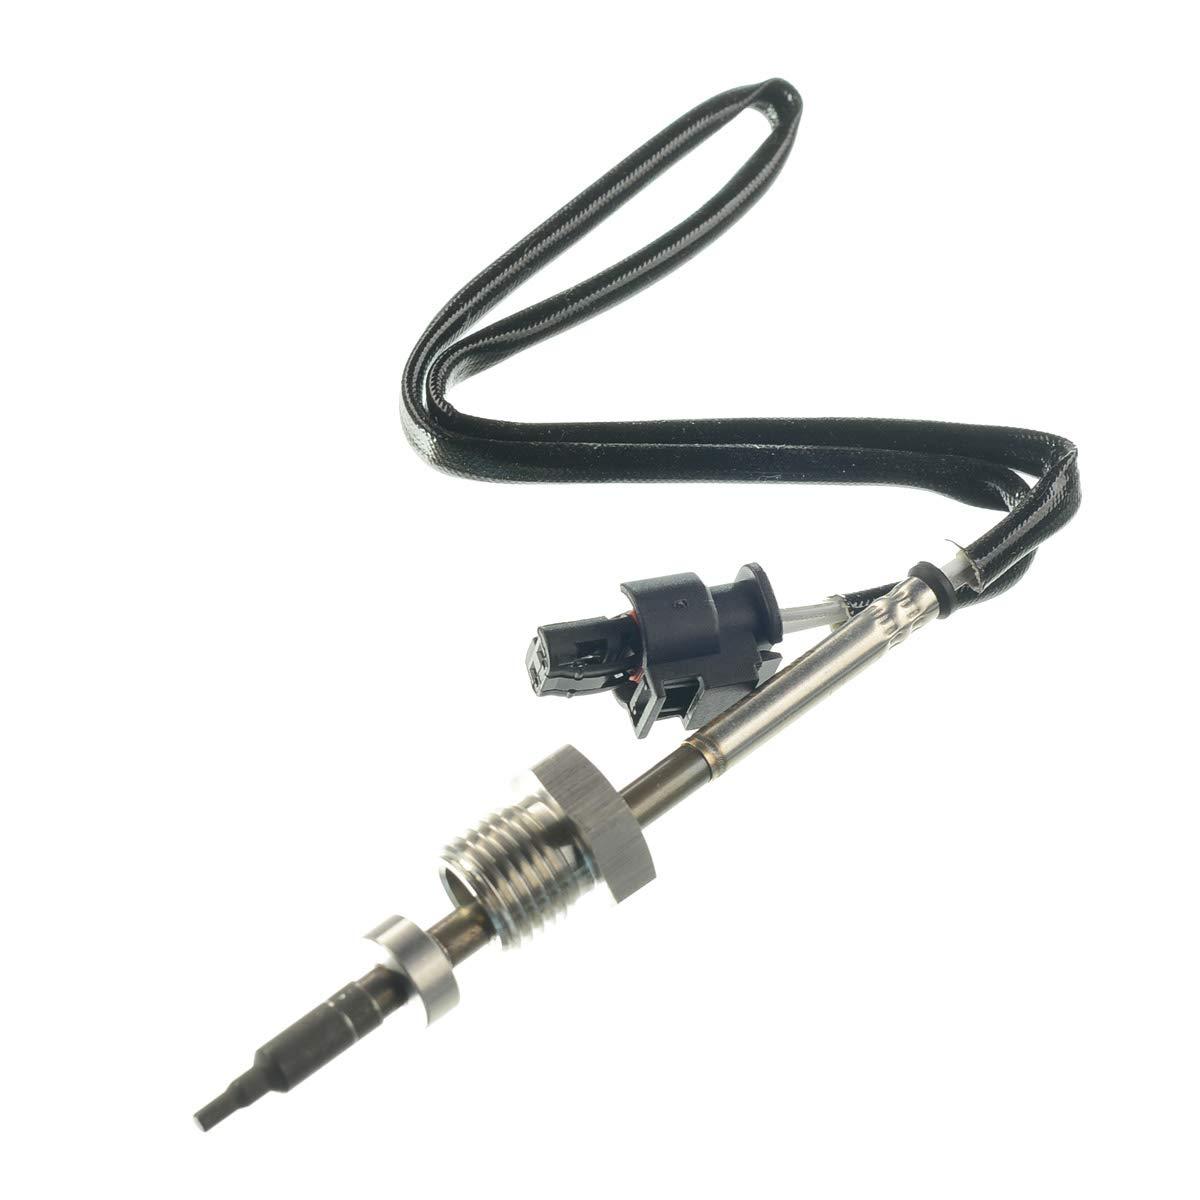 Abgastemperatur Sensor Nach Turbolader f/ür C-Klasse W204 S204 E-Klasse W211 S211 2.1L 2.2L Bj.2006//01-2018//12